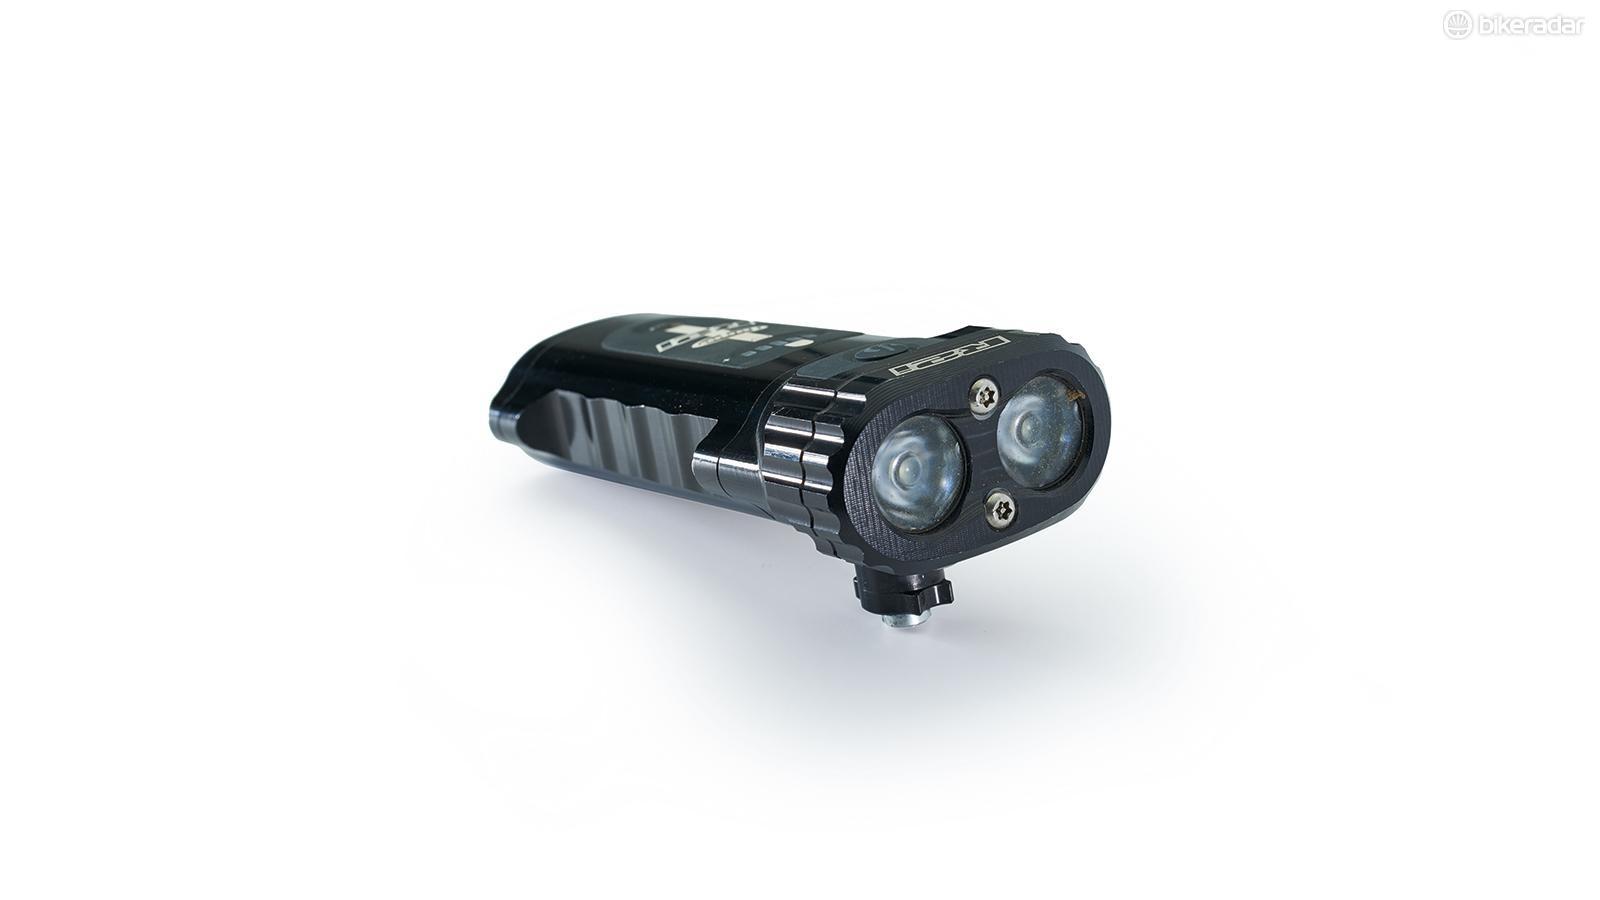 The Hope's R2i LED light is a sturdy little unit